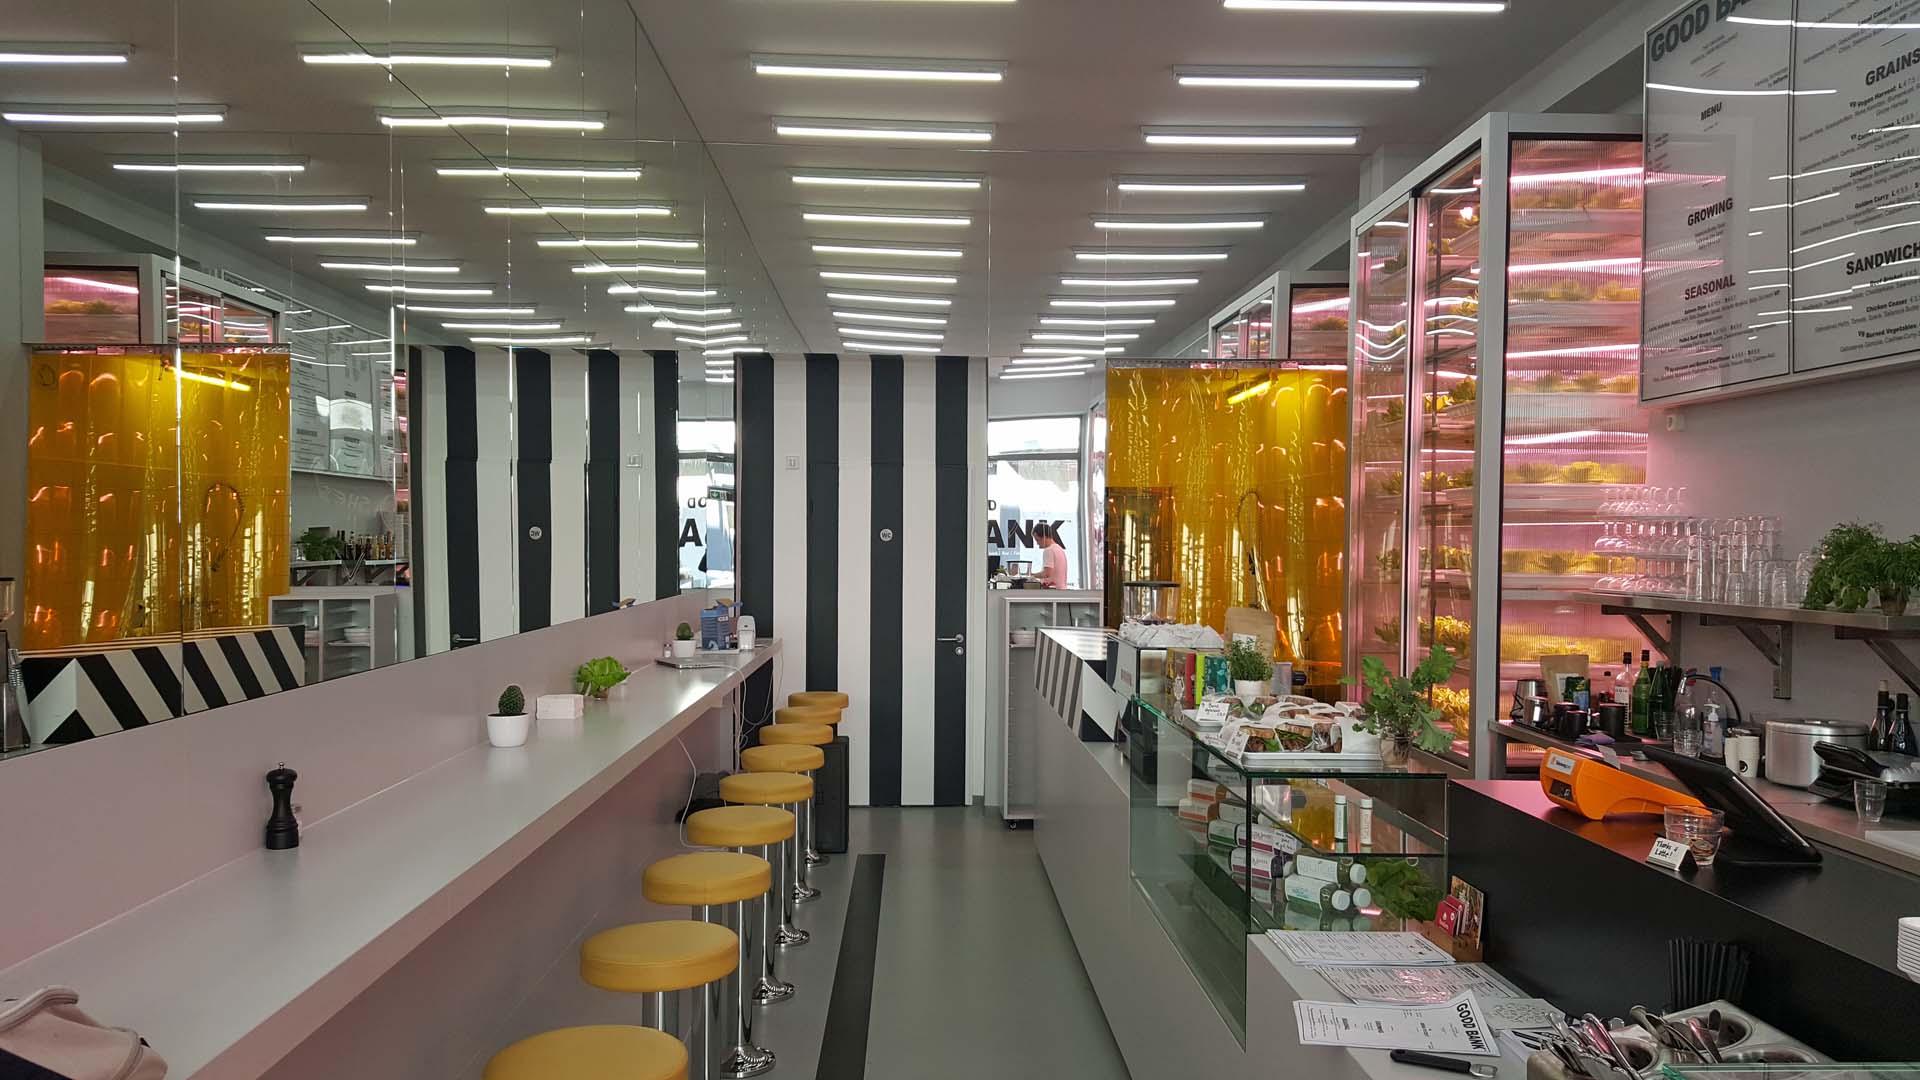 labor atmosph re im restaurant good bank berlin leinenlos. Black Bedroom Furniture Sets. Home Design Ideas